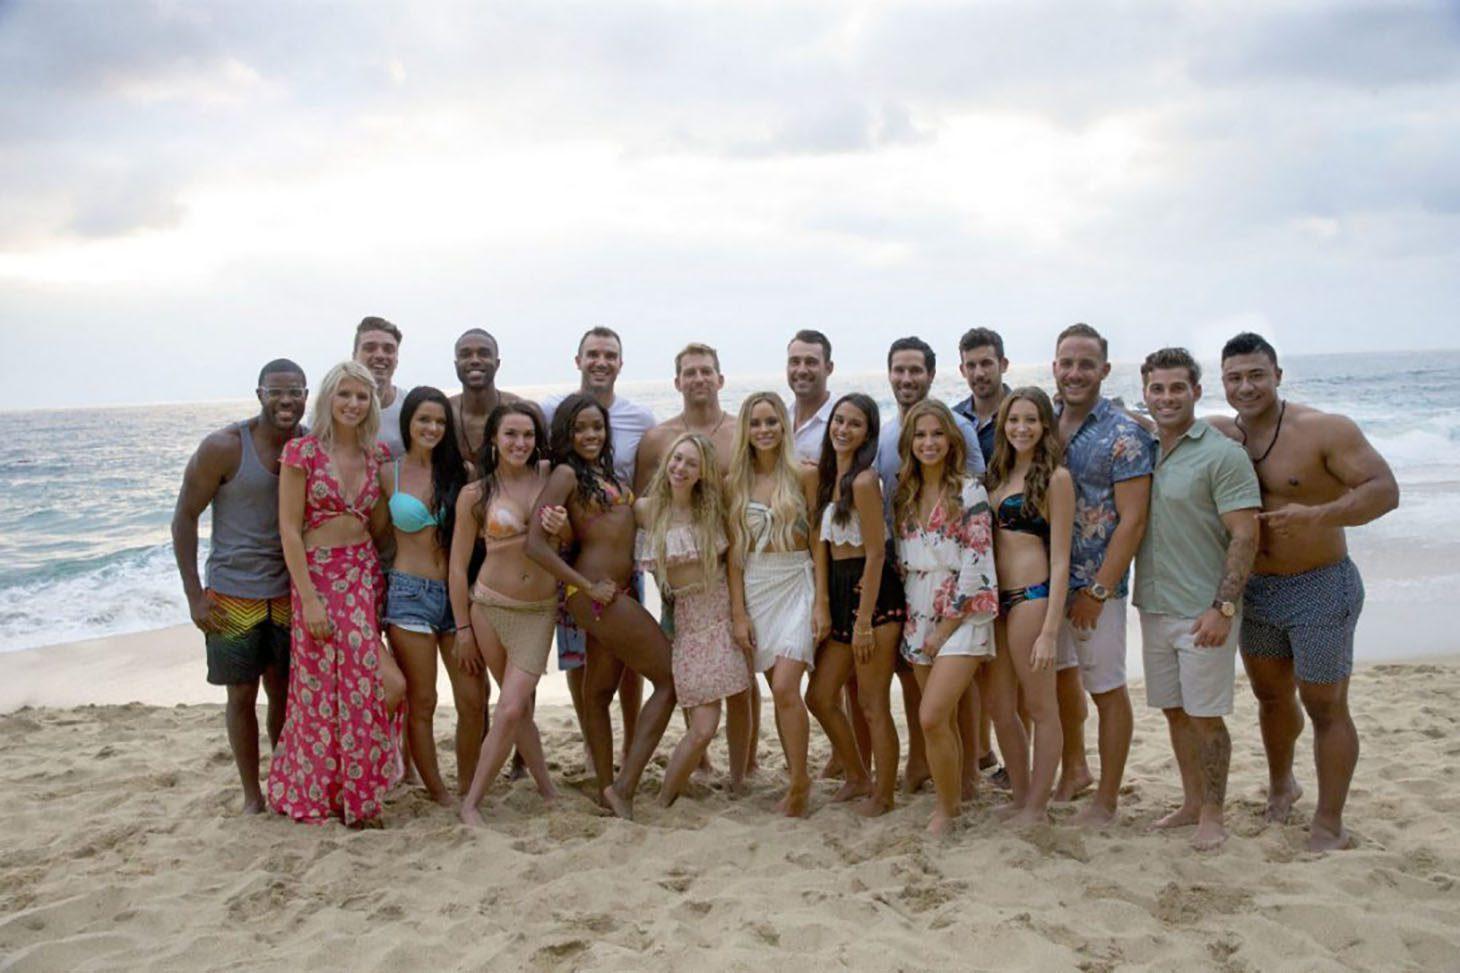 Jiillian Harris Bachelor In Paradise Recap